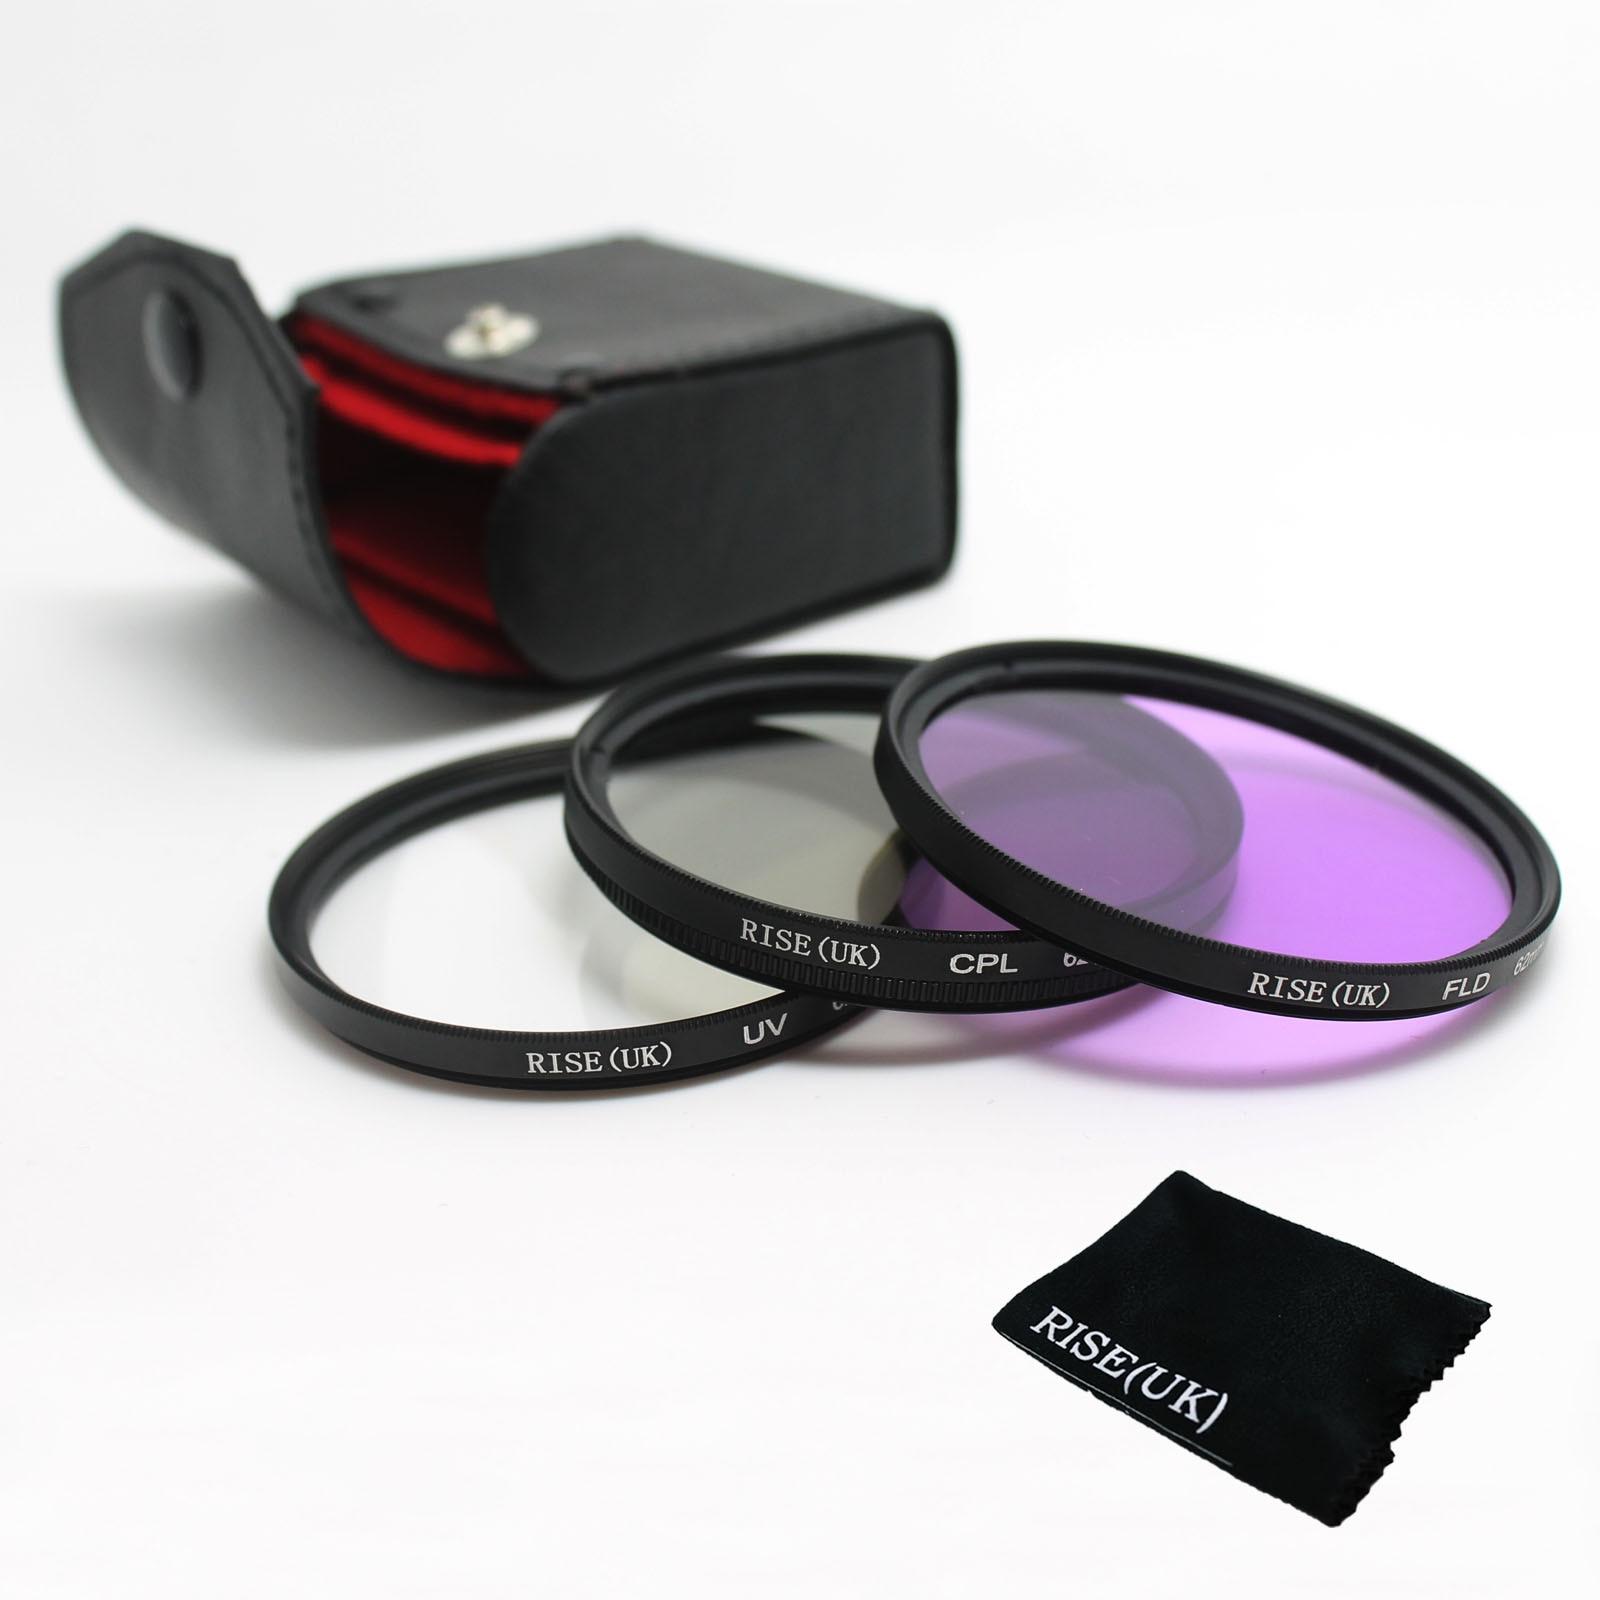 RISE (UK) 49mm 52mm 55mm 58mm 62mm 67mm 72mm 77mm UV + FLD + CPL Objektiv Filter Protector für canon nikon pentax sony dslr kamera